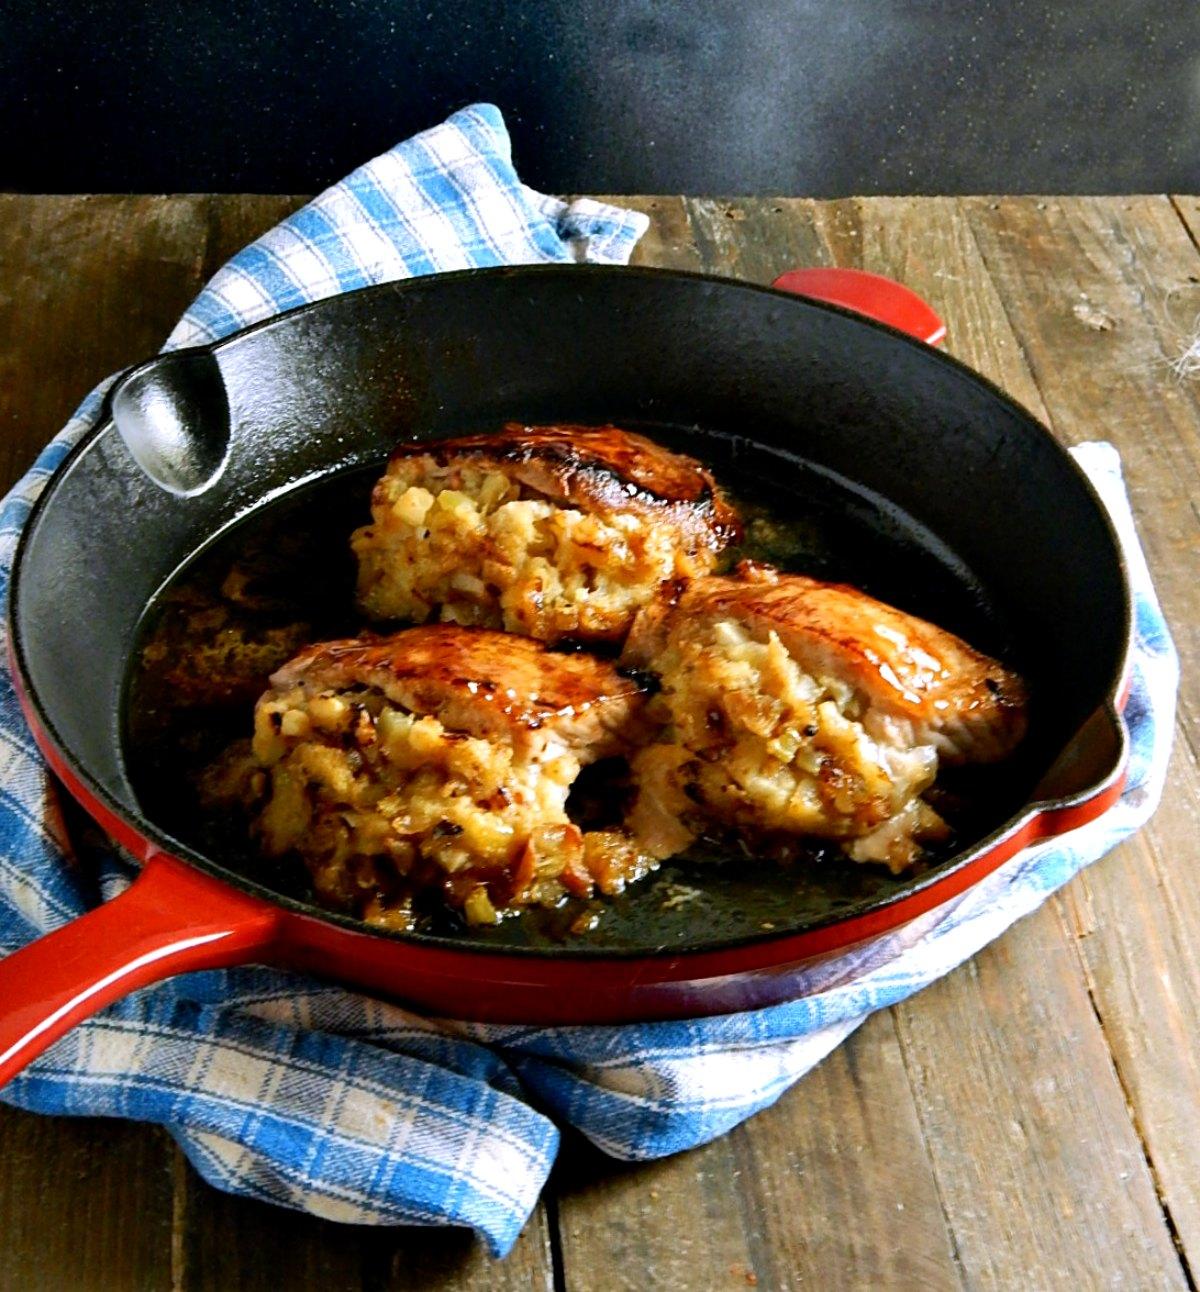 Apple Glazed Stuffed Pork Chops